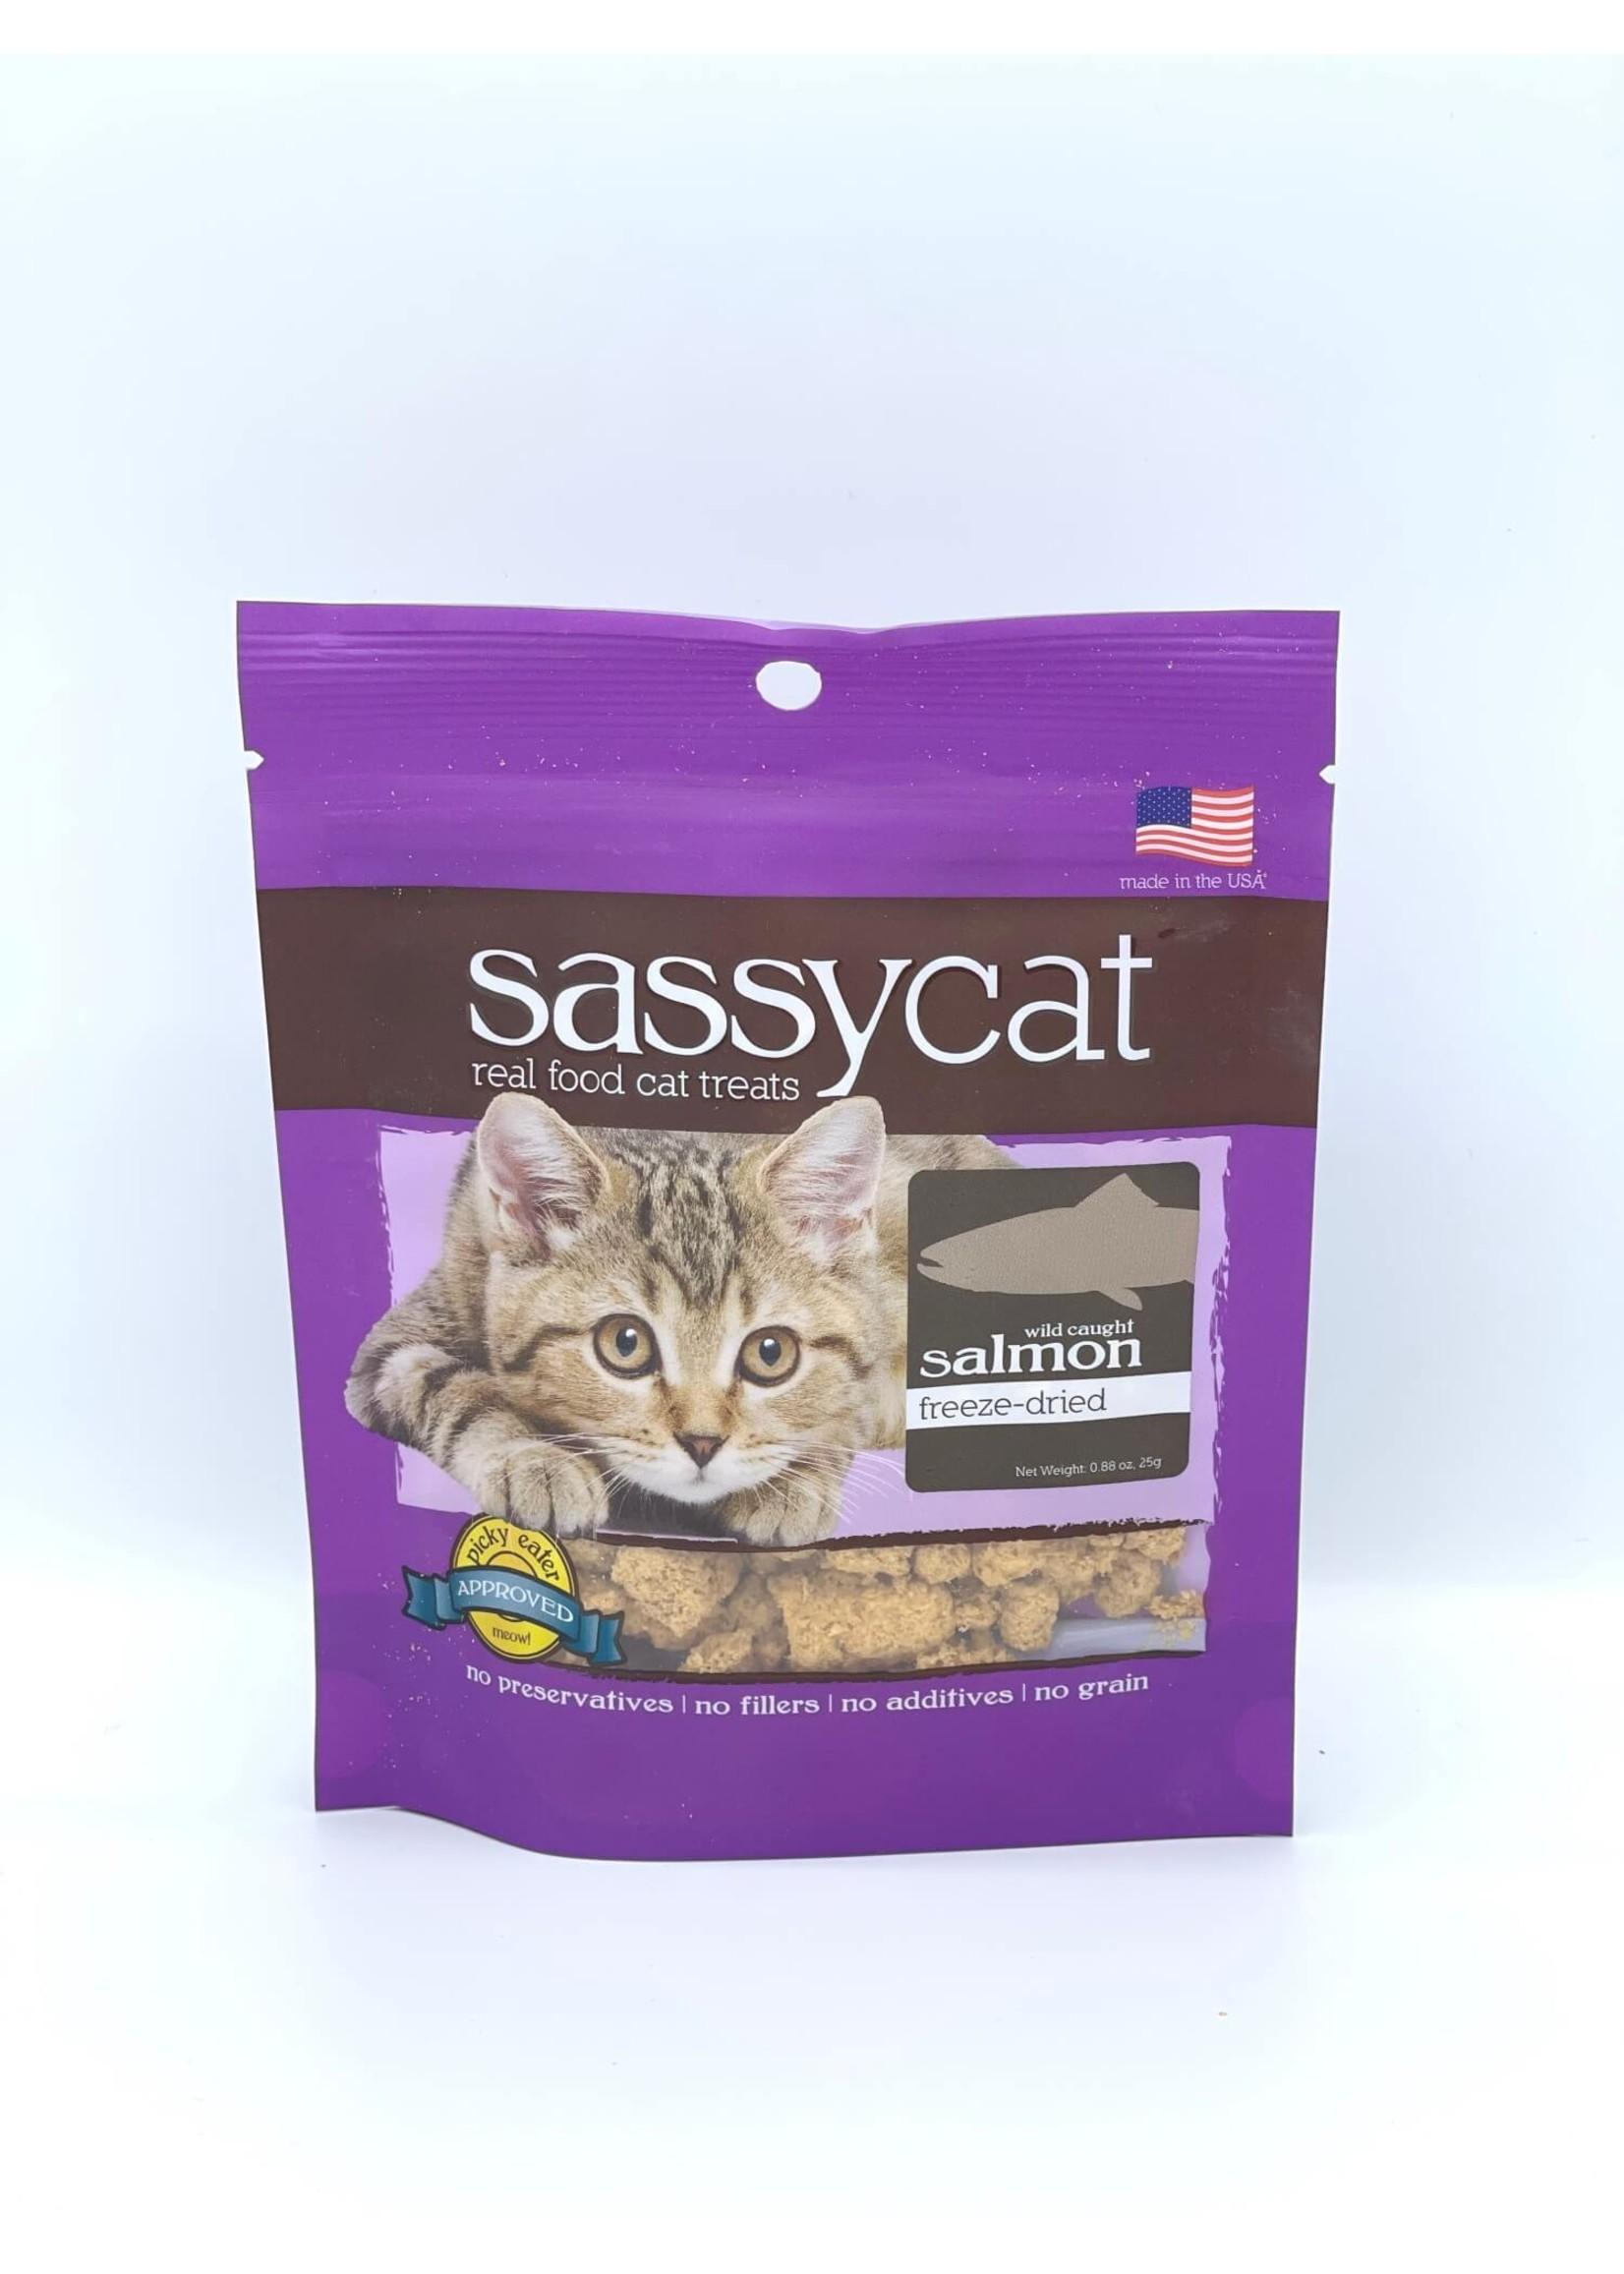 Herbsmith Herbsmith Sassy Cat Treats Salmon